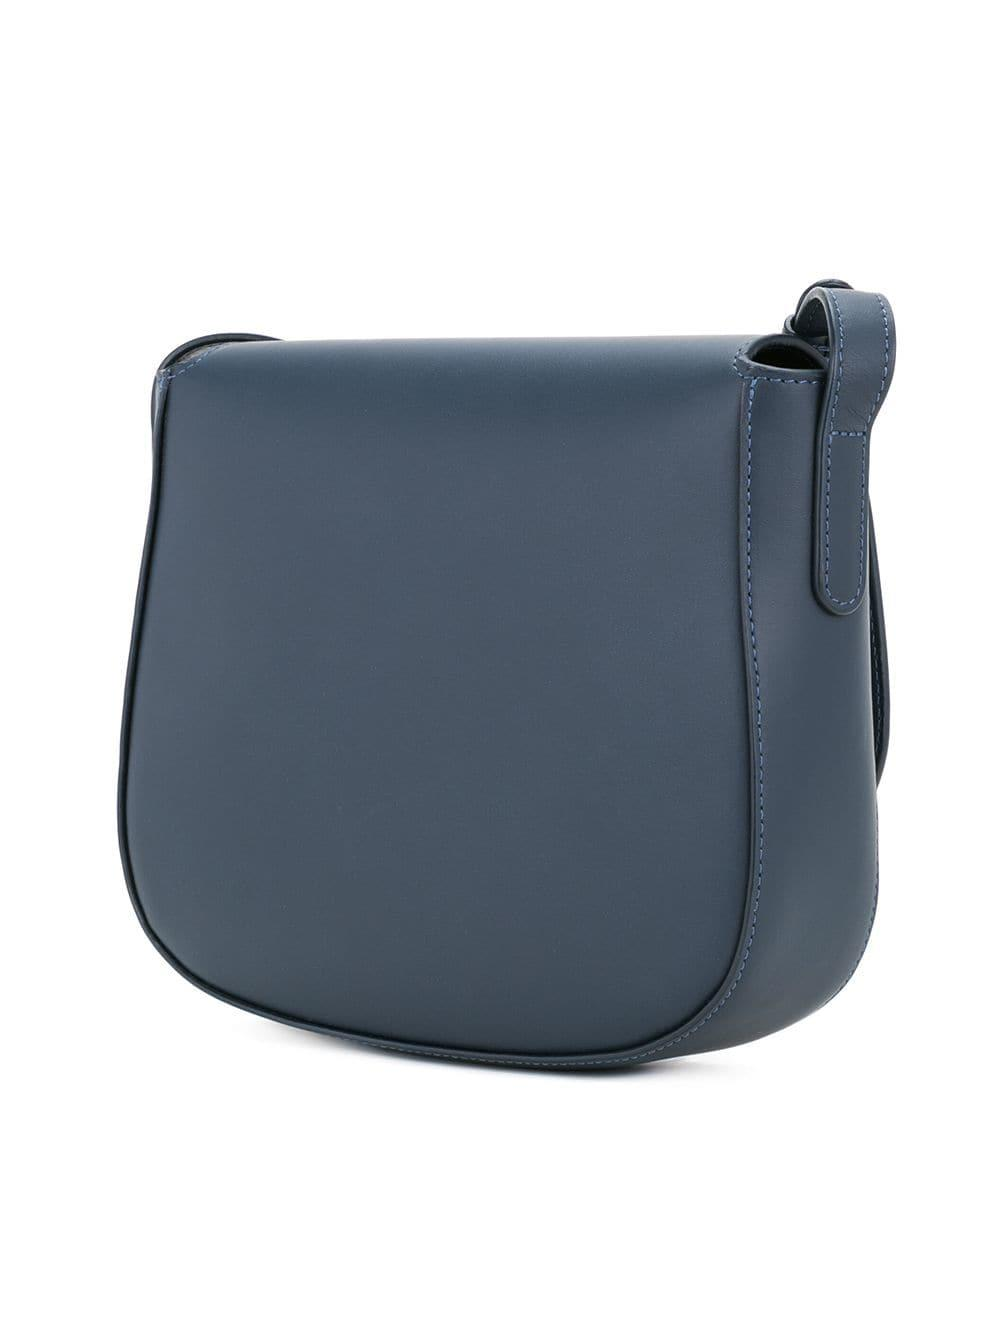 Mansur Gavriel Leather Crossbody Bag in Blue